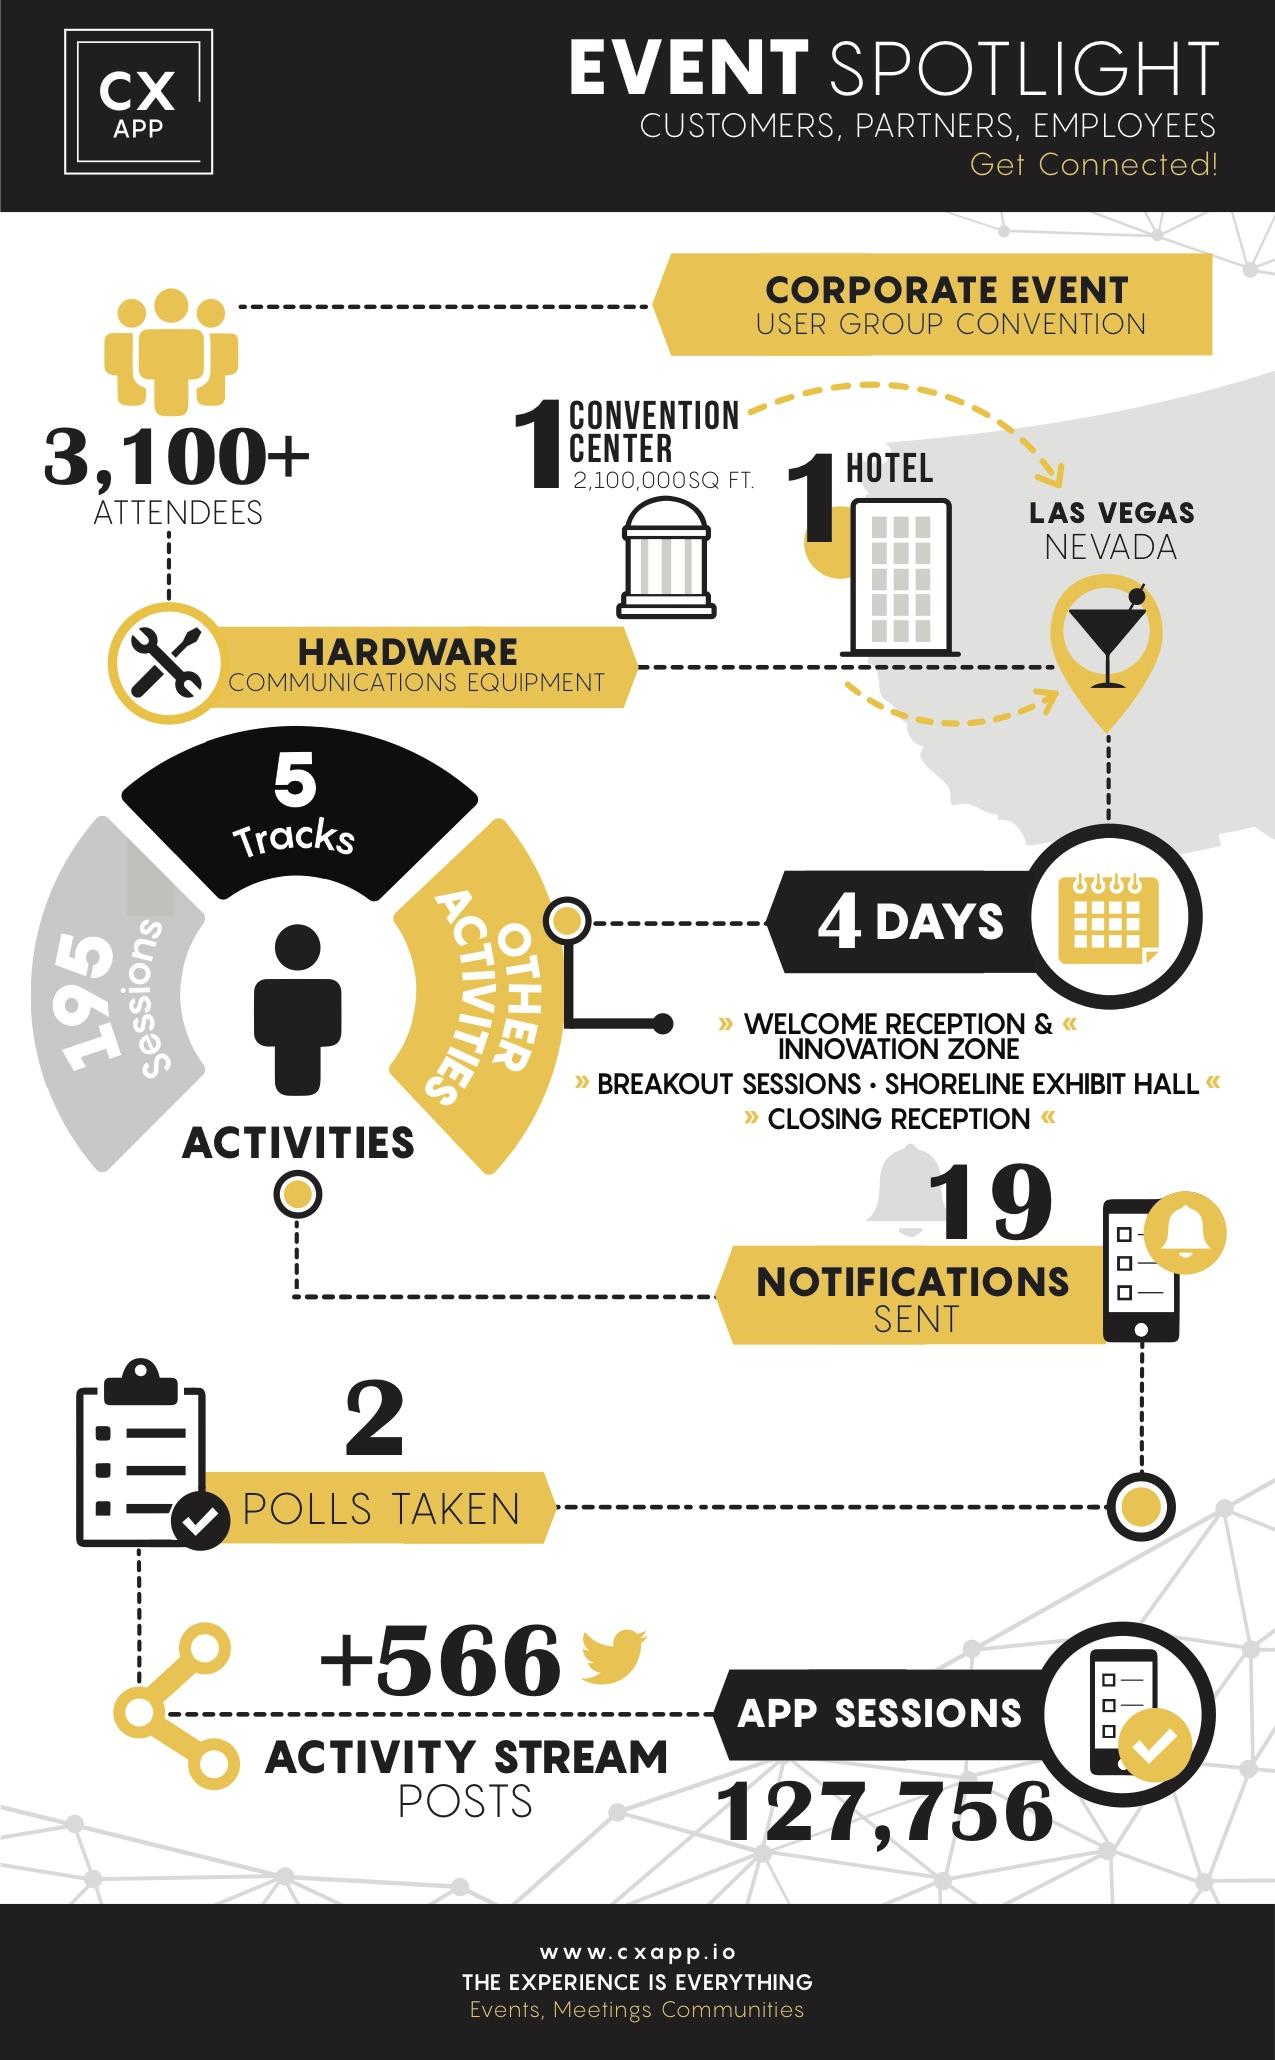 Event Spotlight - Las Vegas 4-2018 - Proof 3.jpg